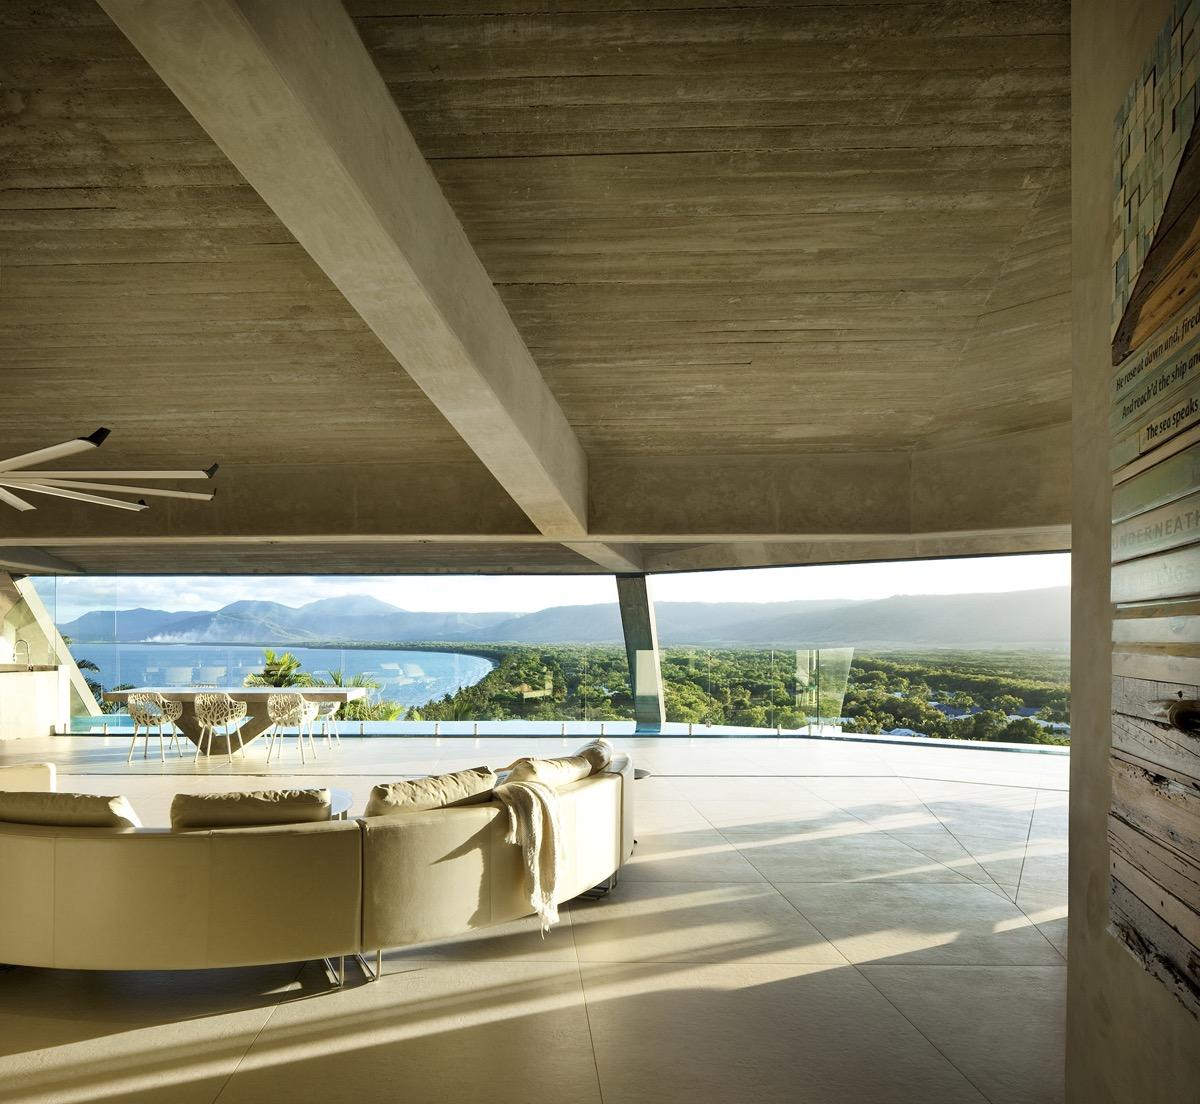 Di daniela curia su pinterest. A Sculptural Cliffside Home With A Breathtaking Tropical View